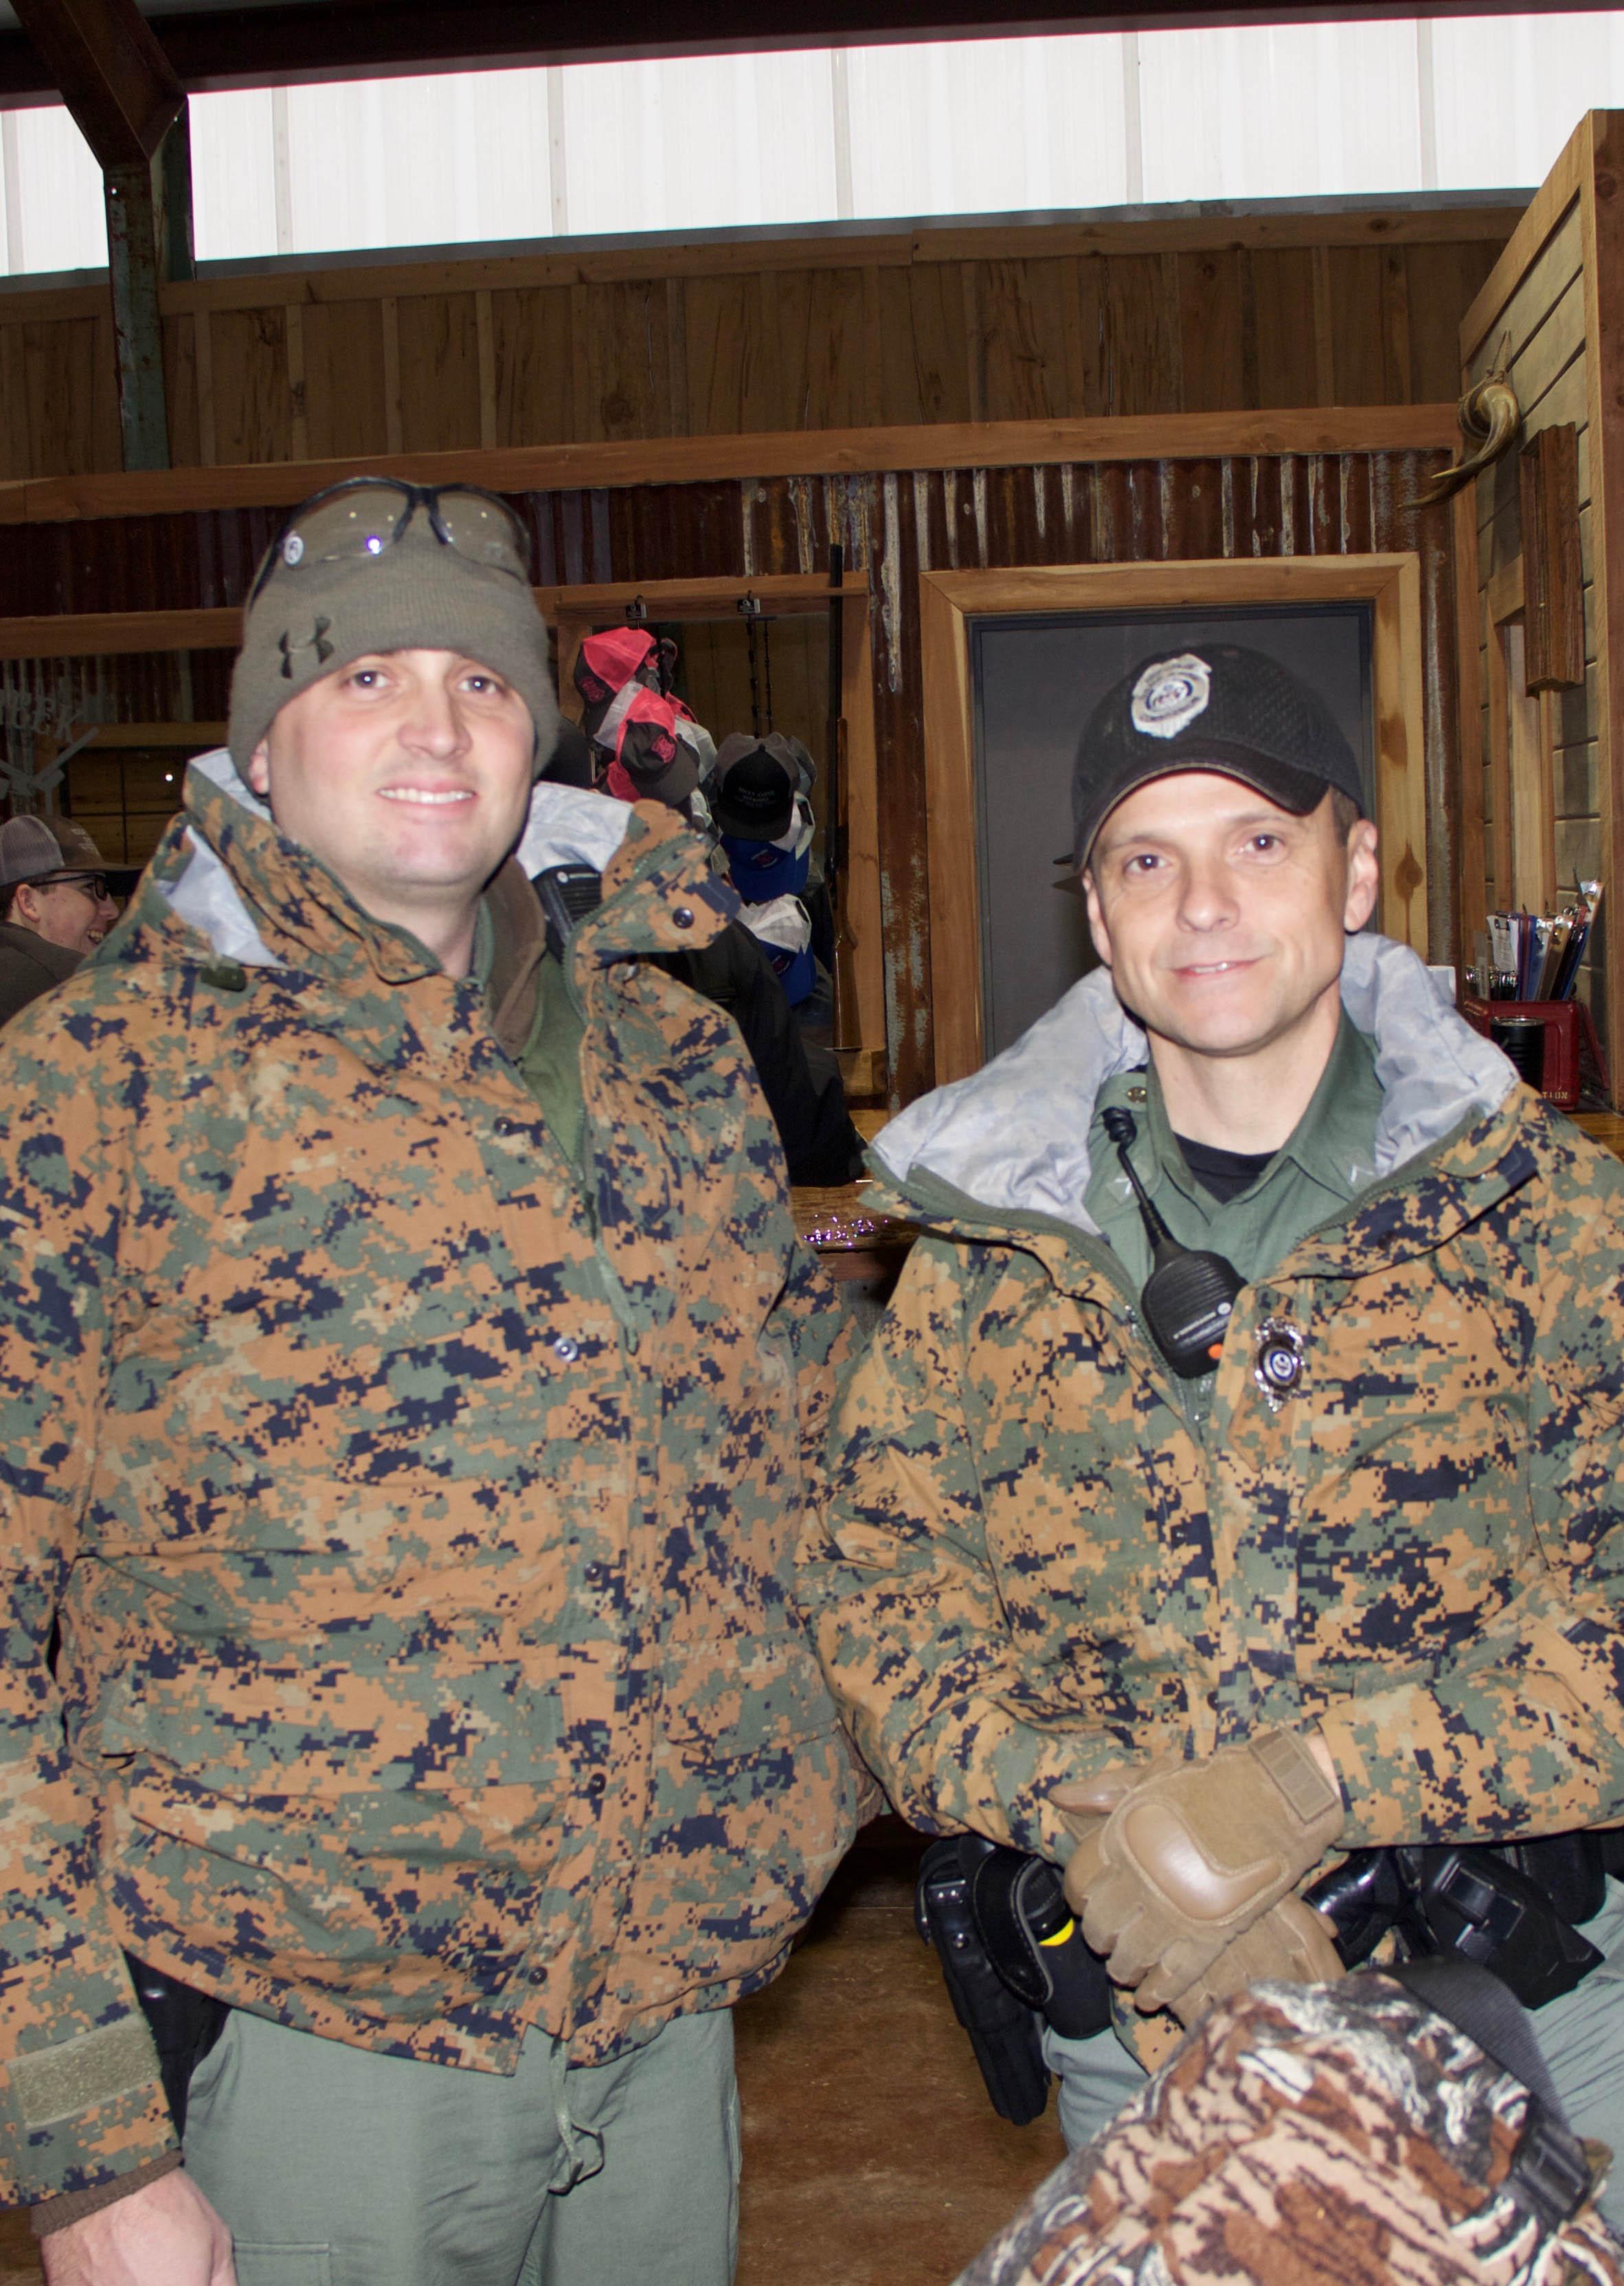 Arkansas Game & Fish Corporal Jay Thomas and Wildlife Officer 1st Class John Cowart